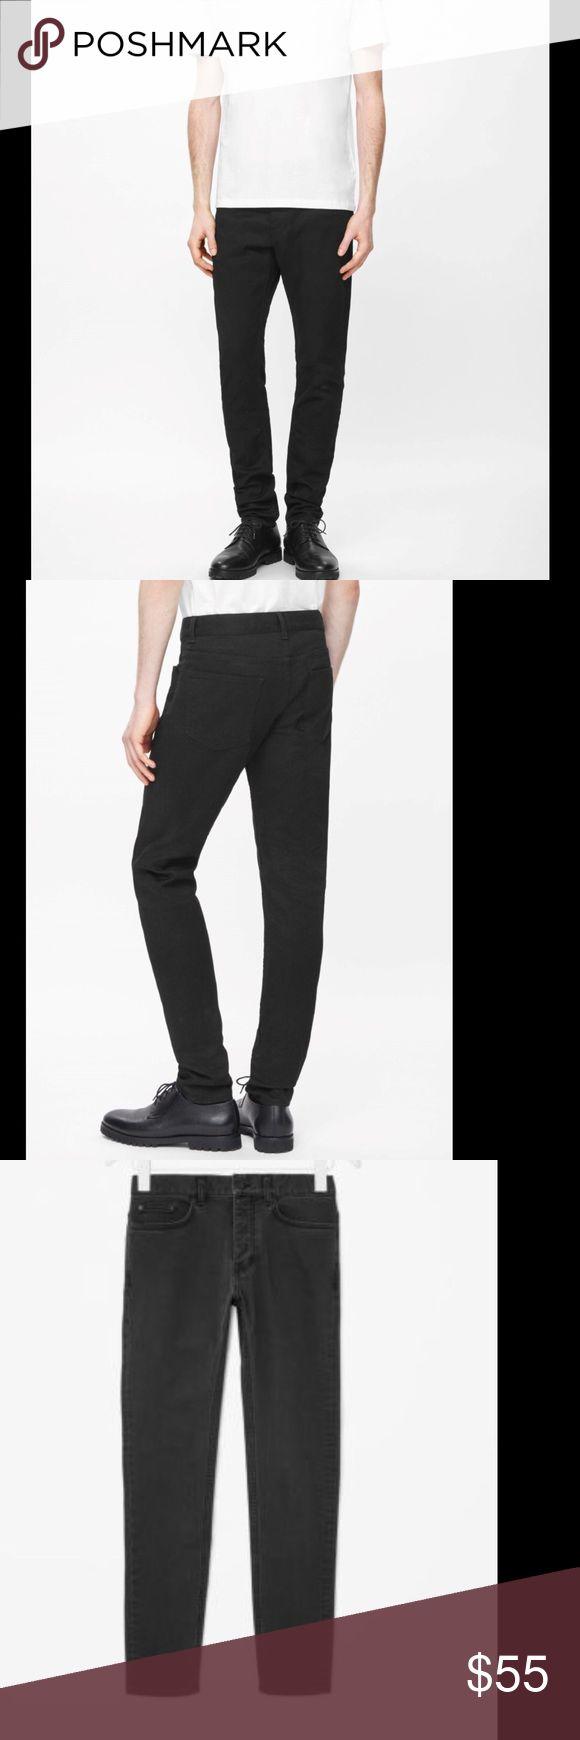 COS black slim tapered jeans Sz 32/32 Black slim tapered jeans worn 1x Retail $149 COS Jeans Slim